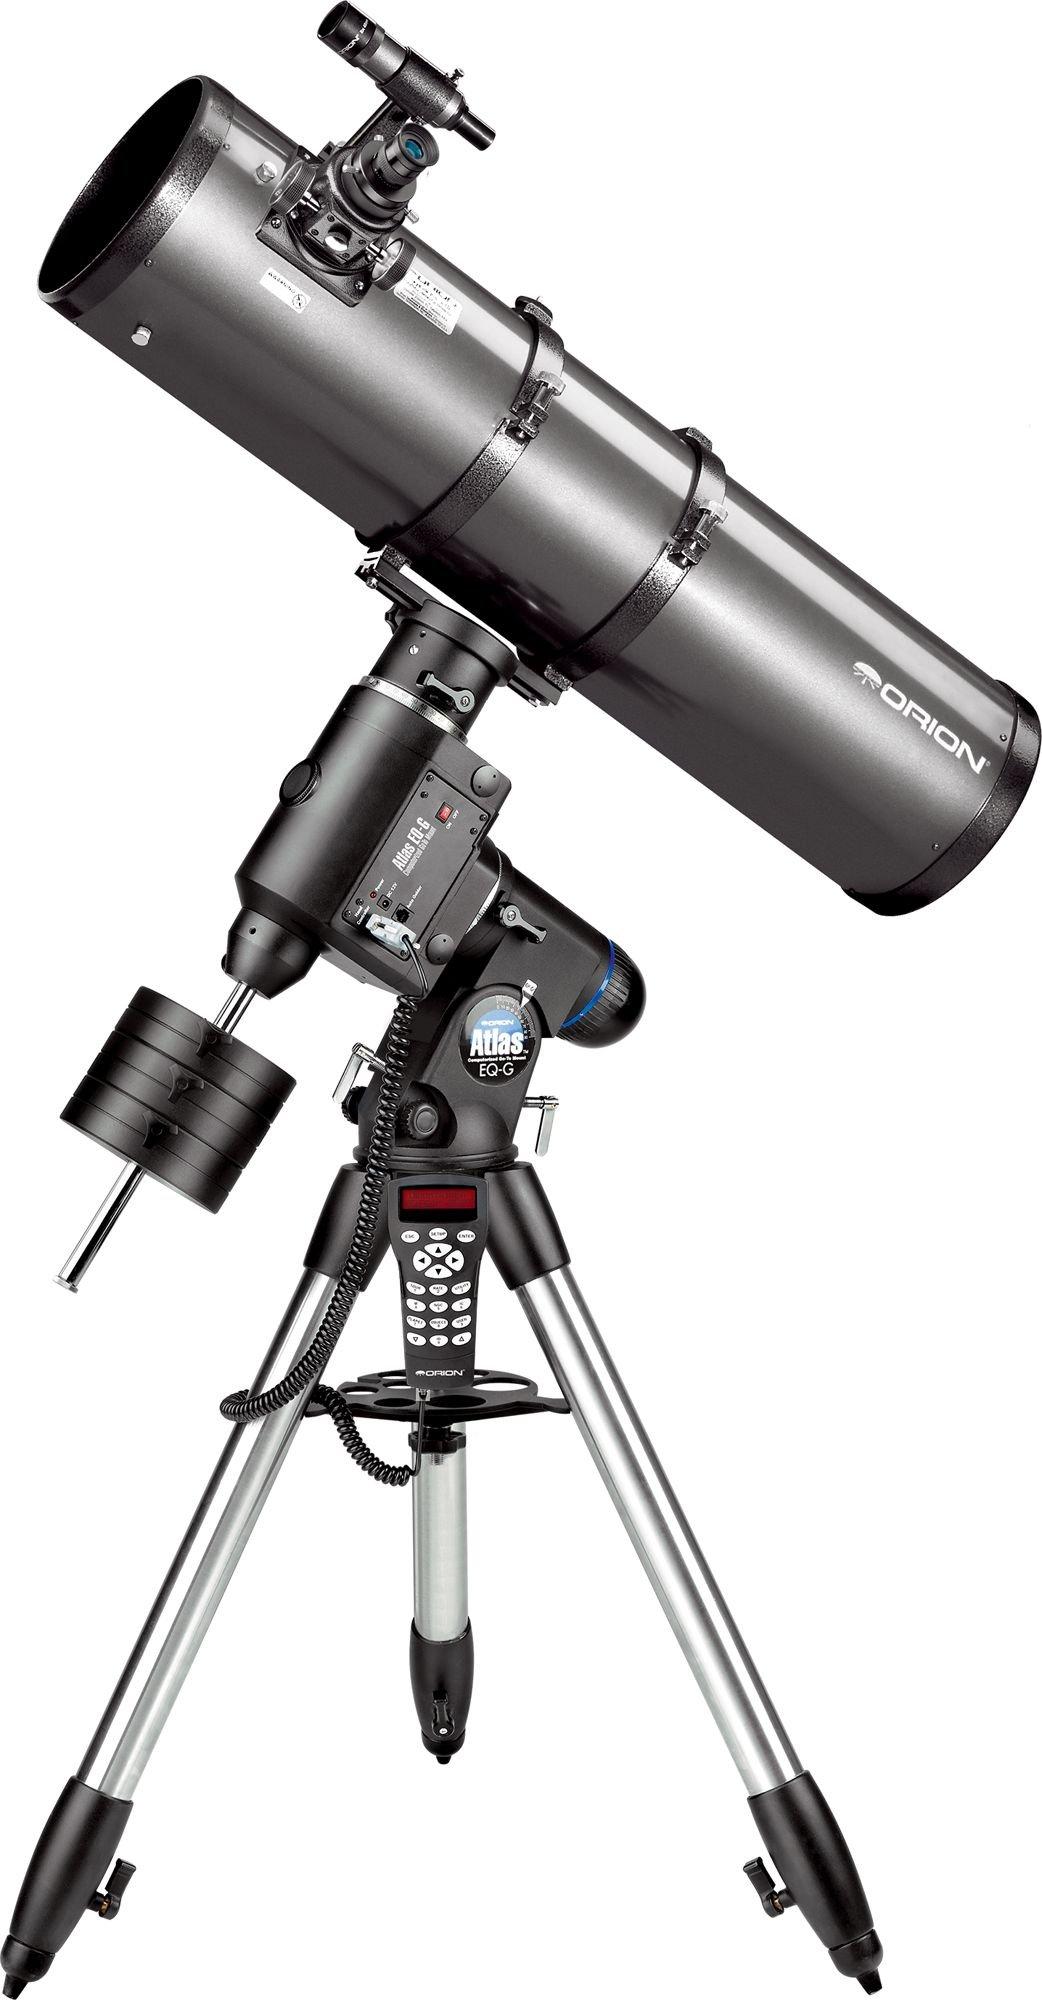 Orion Atlas 8 EQ-G GoTo Reflector Telescope by Orion